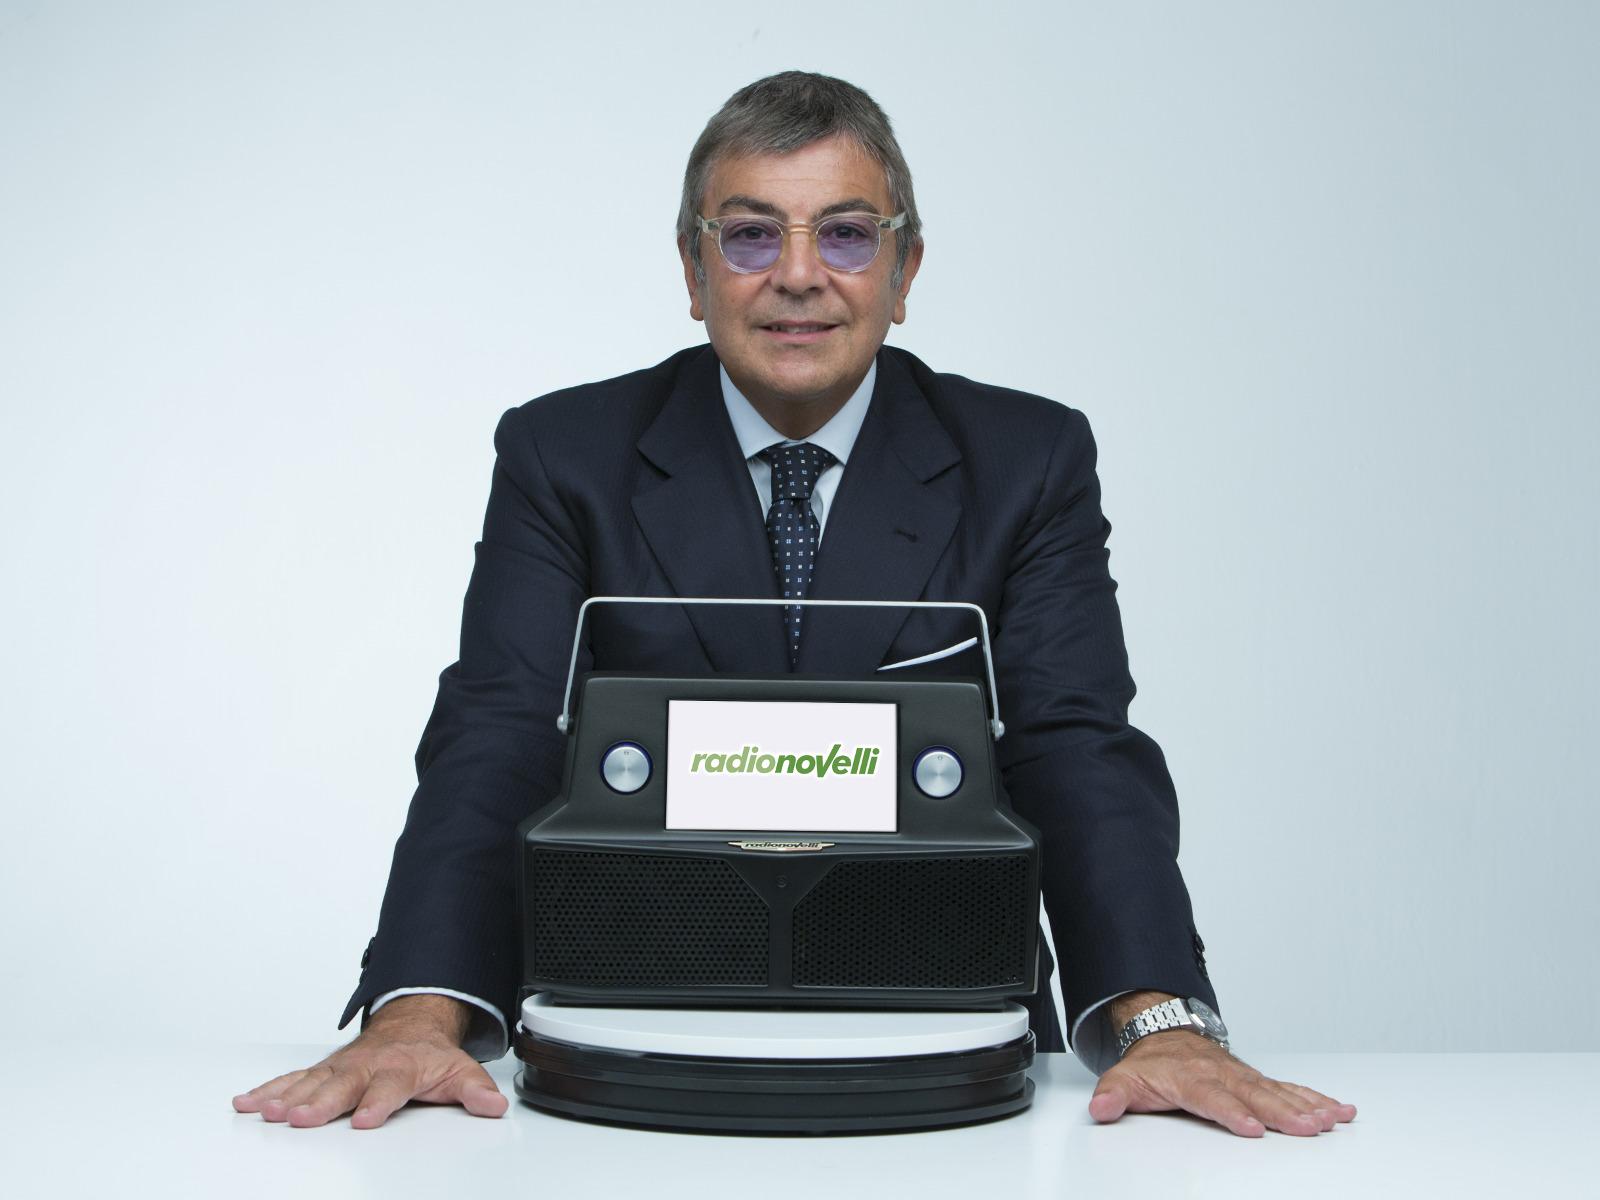 Radio 4G e Paolo Novelli